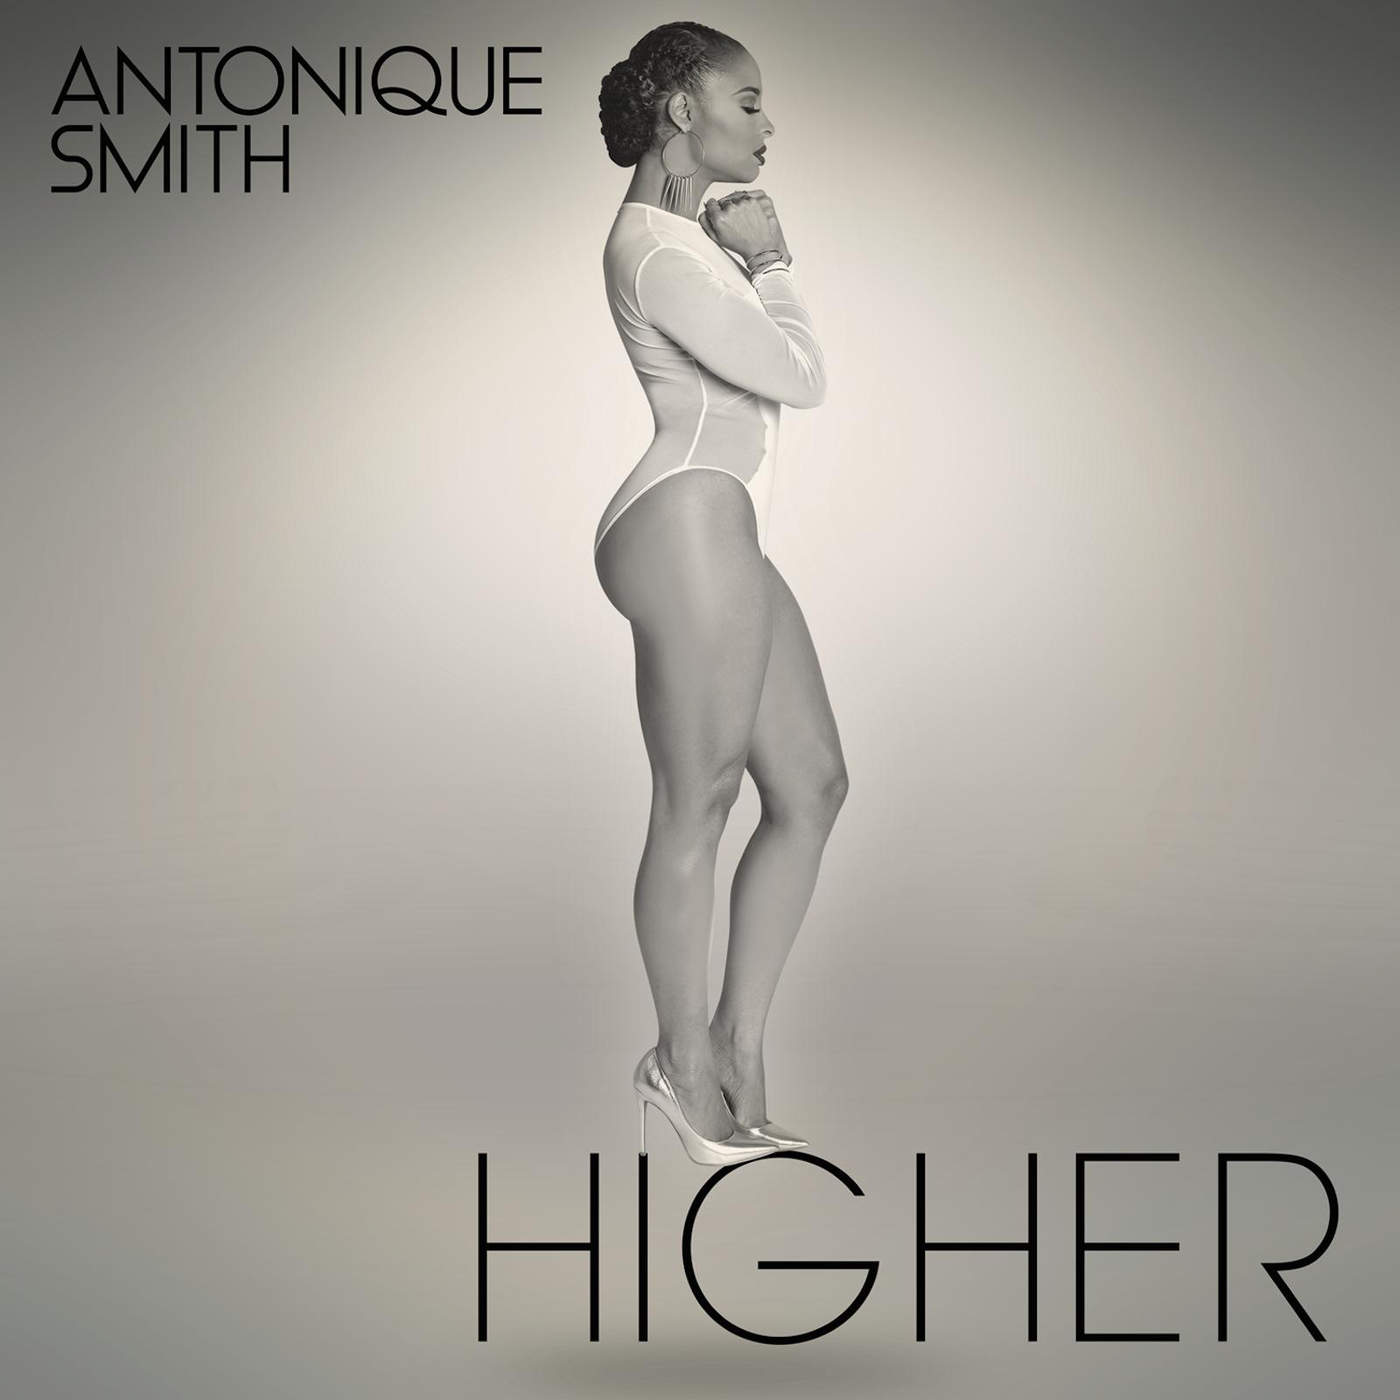 ANTONIQUE SMITH </br> Higher